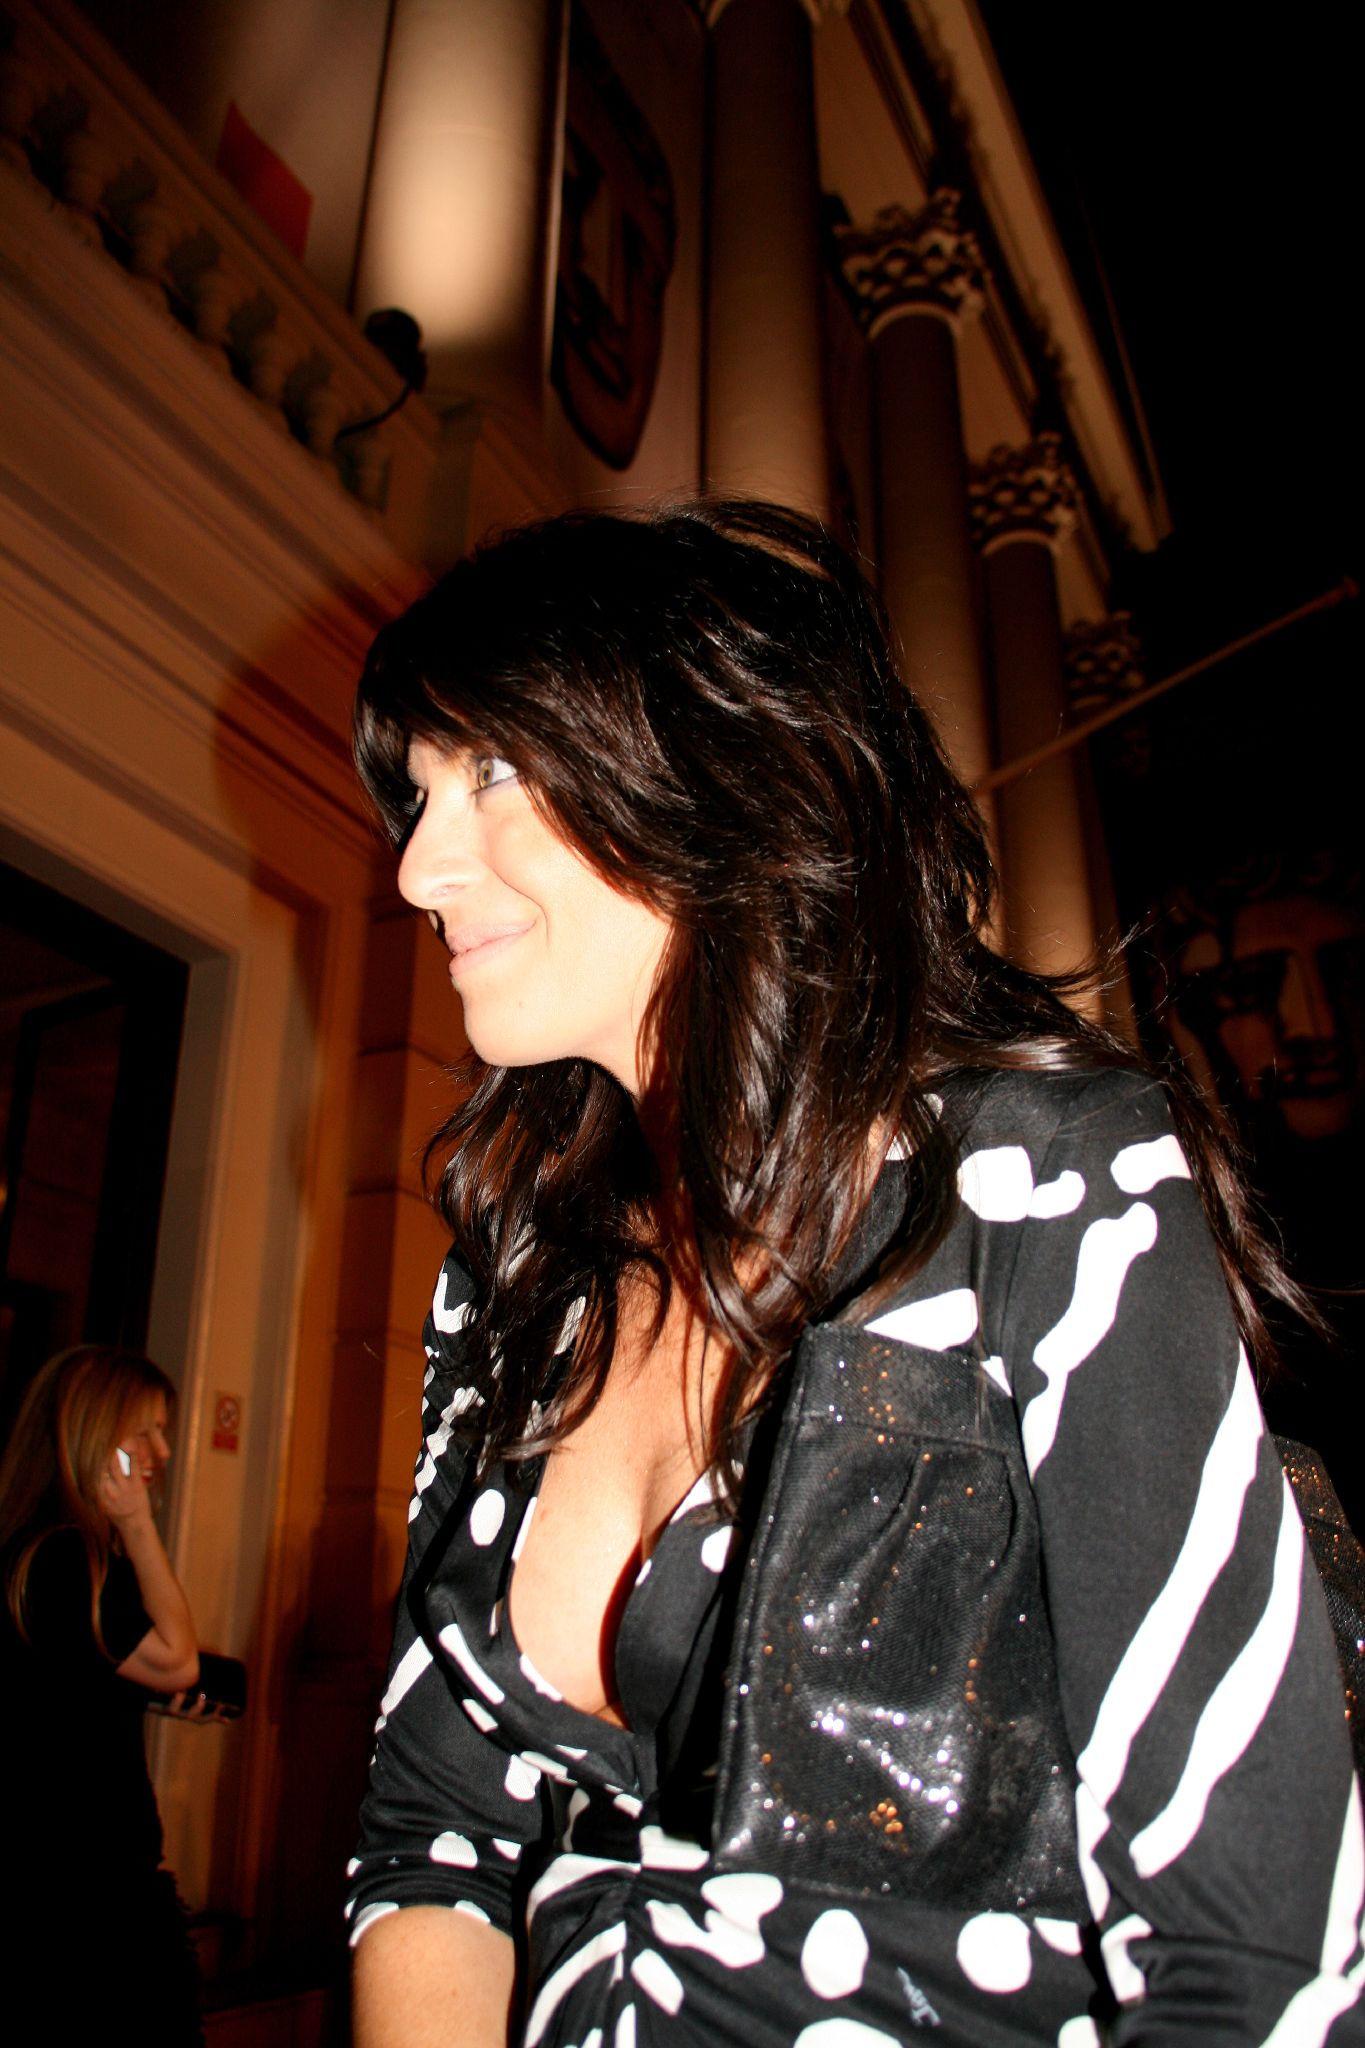 Photo of Claudia Winkleman: British television presenter